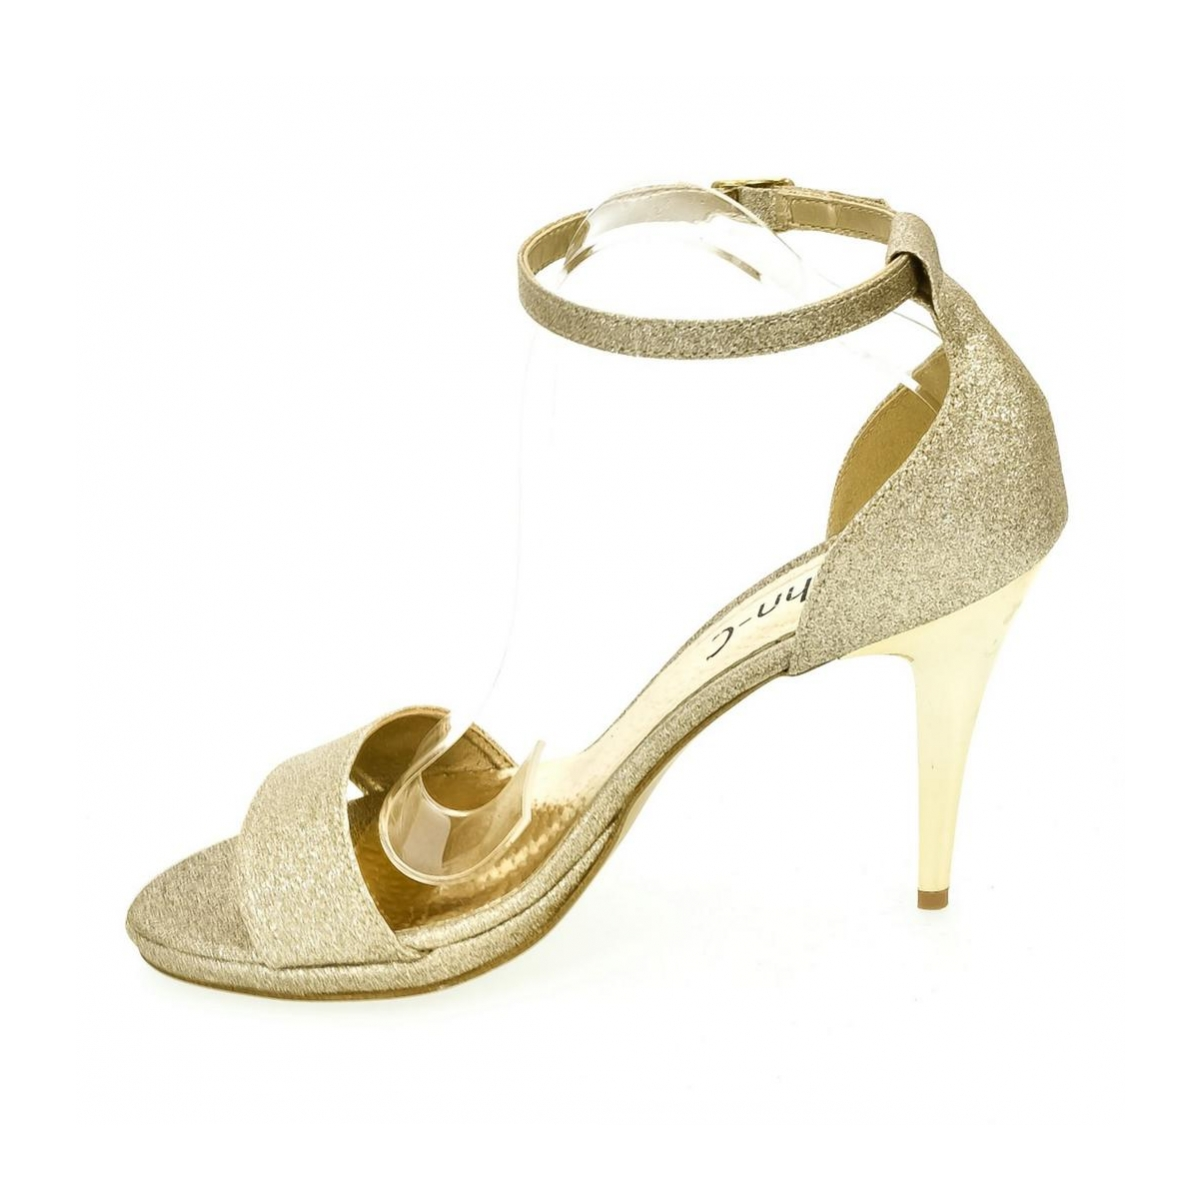 781f856db5f4 Dámske zlaté sandále KAJA - 5